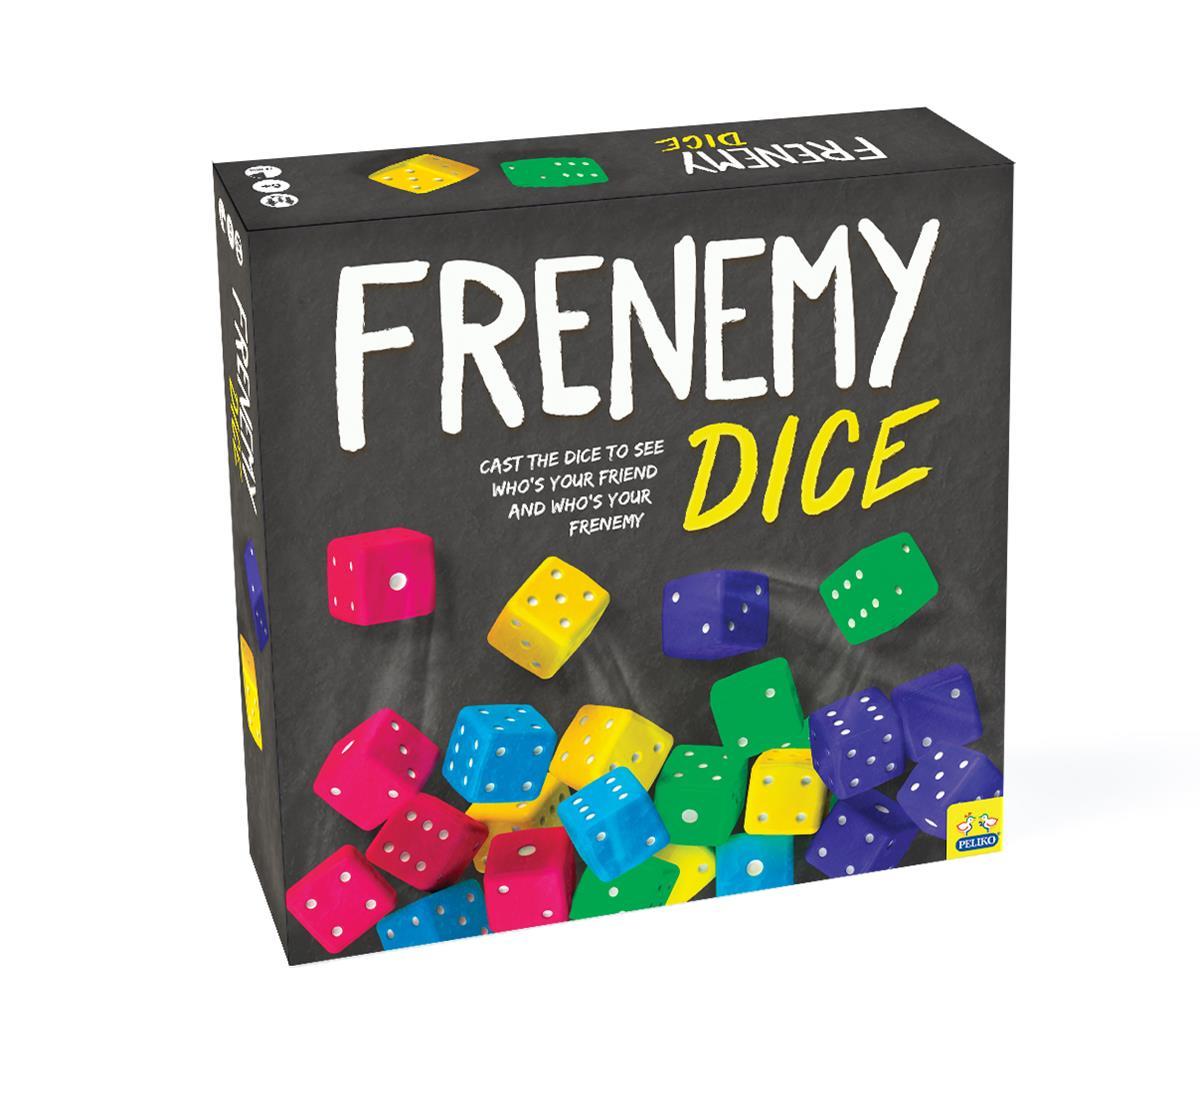 Peliko - Frenemy dice